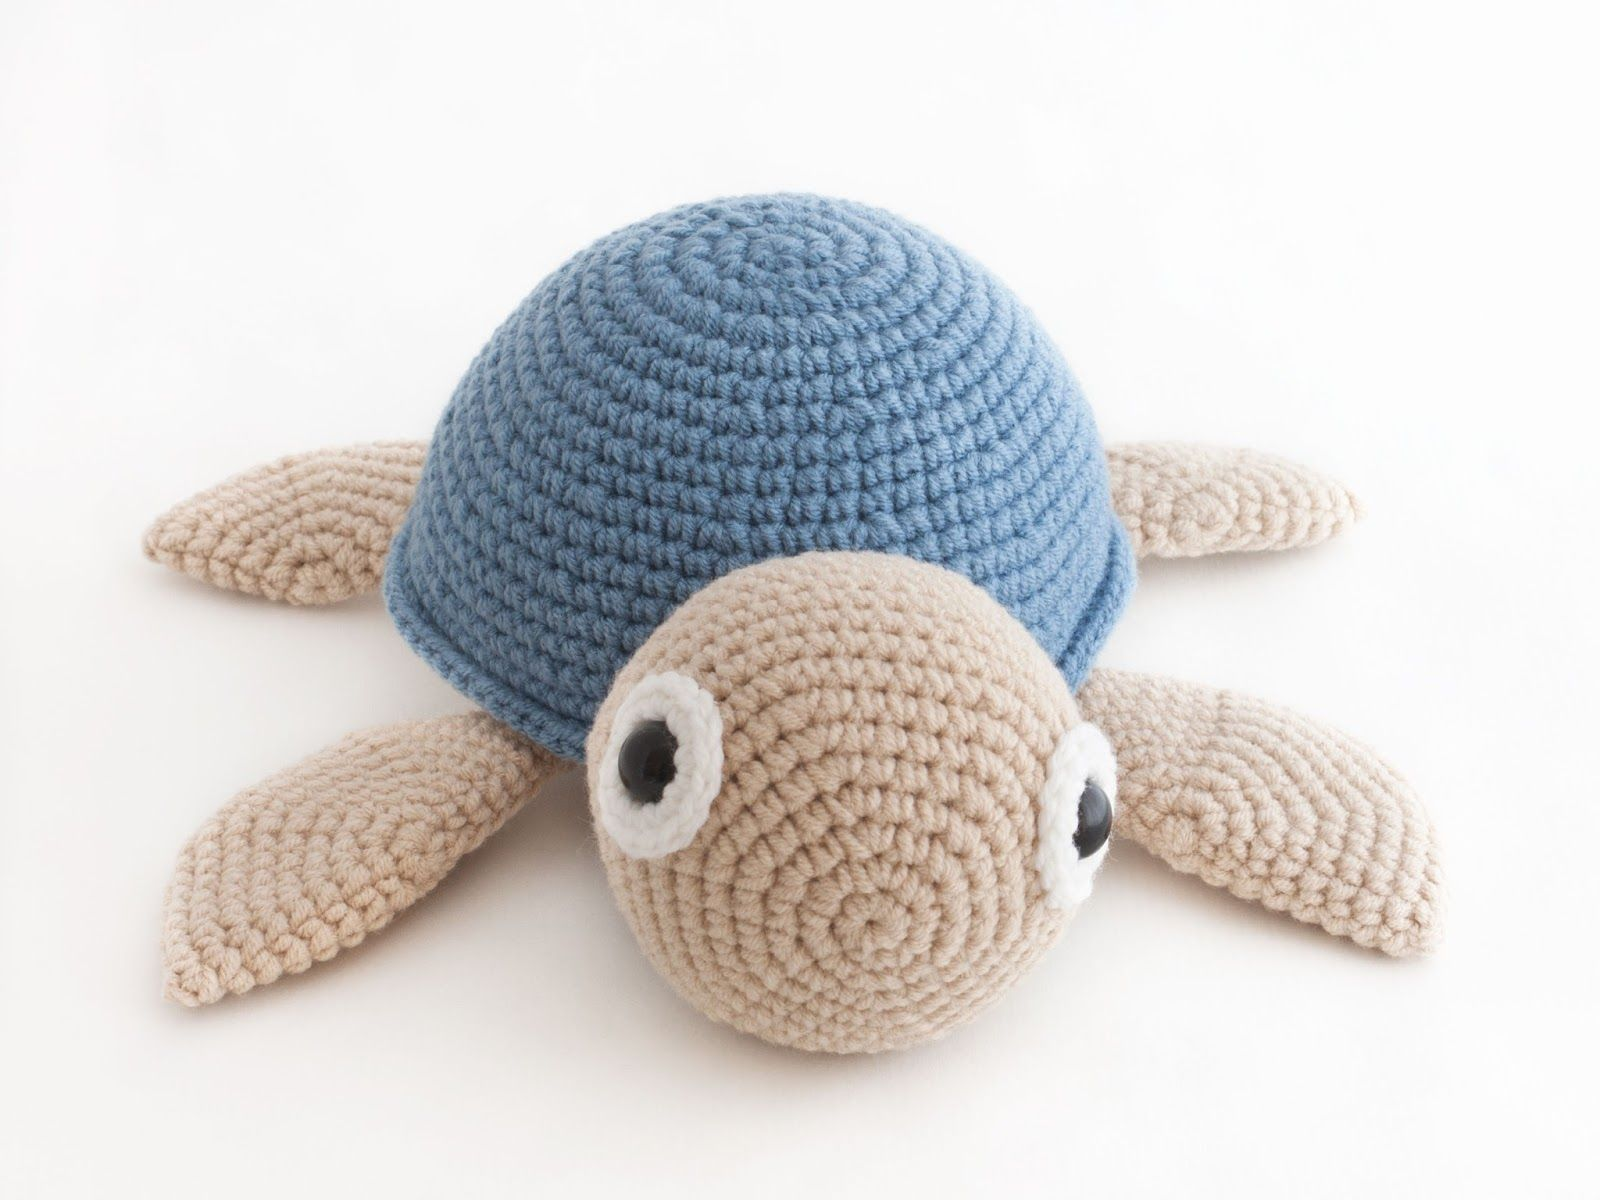 Amigurumi tortuga (enlace a patron gratis) | Doaa | Pinterest ...